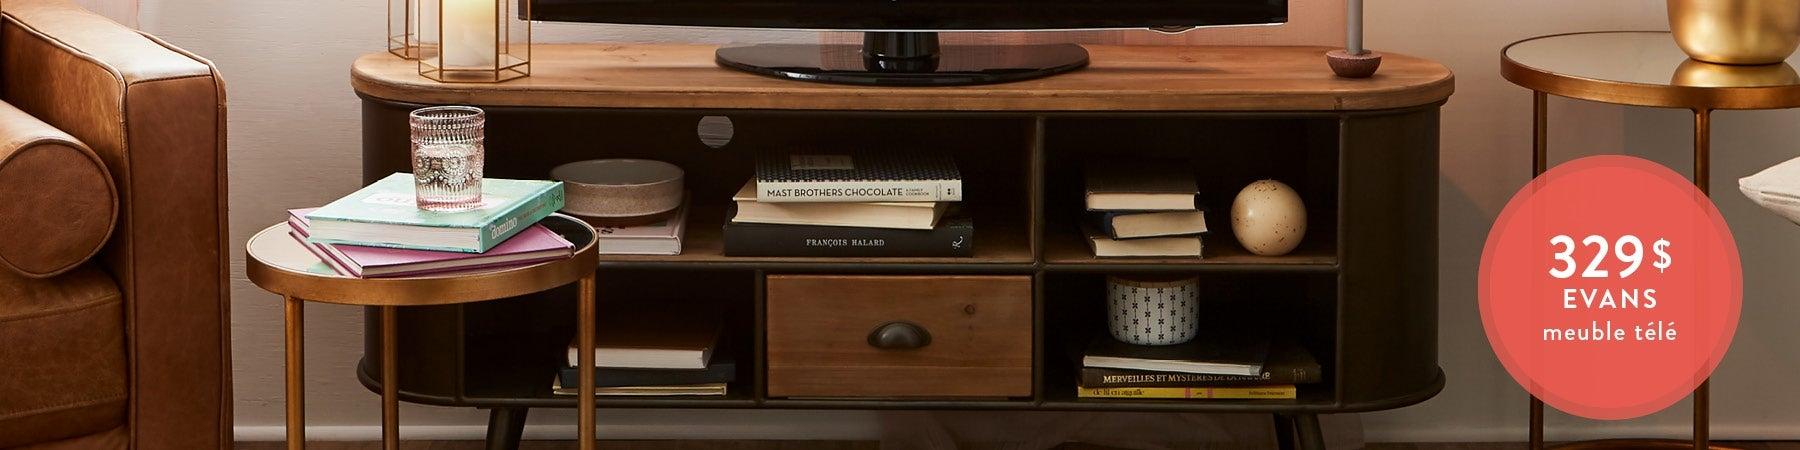 Audio Meubles Télé Supports Modernes VidéoStructube wN80Ovmn